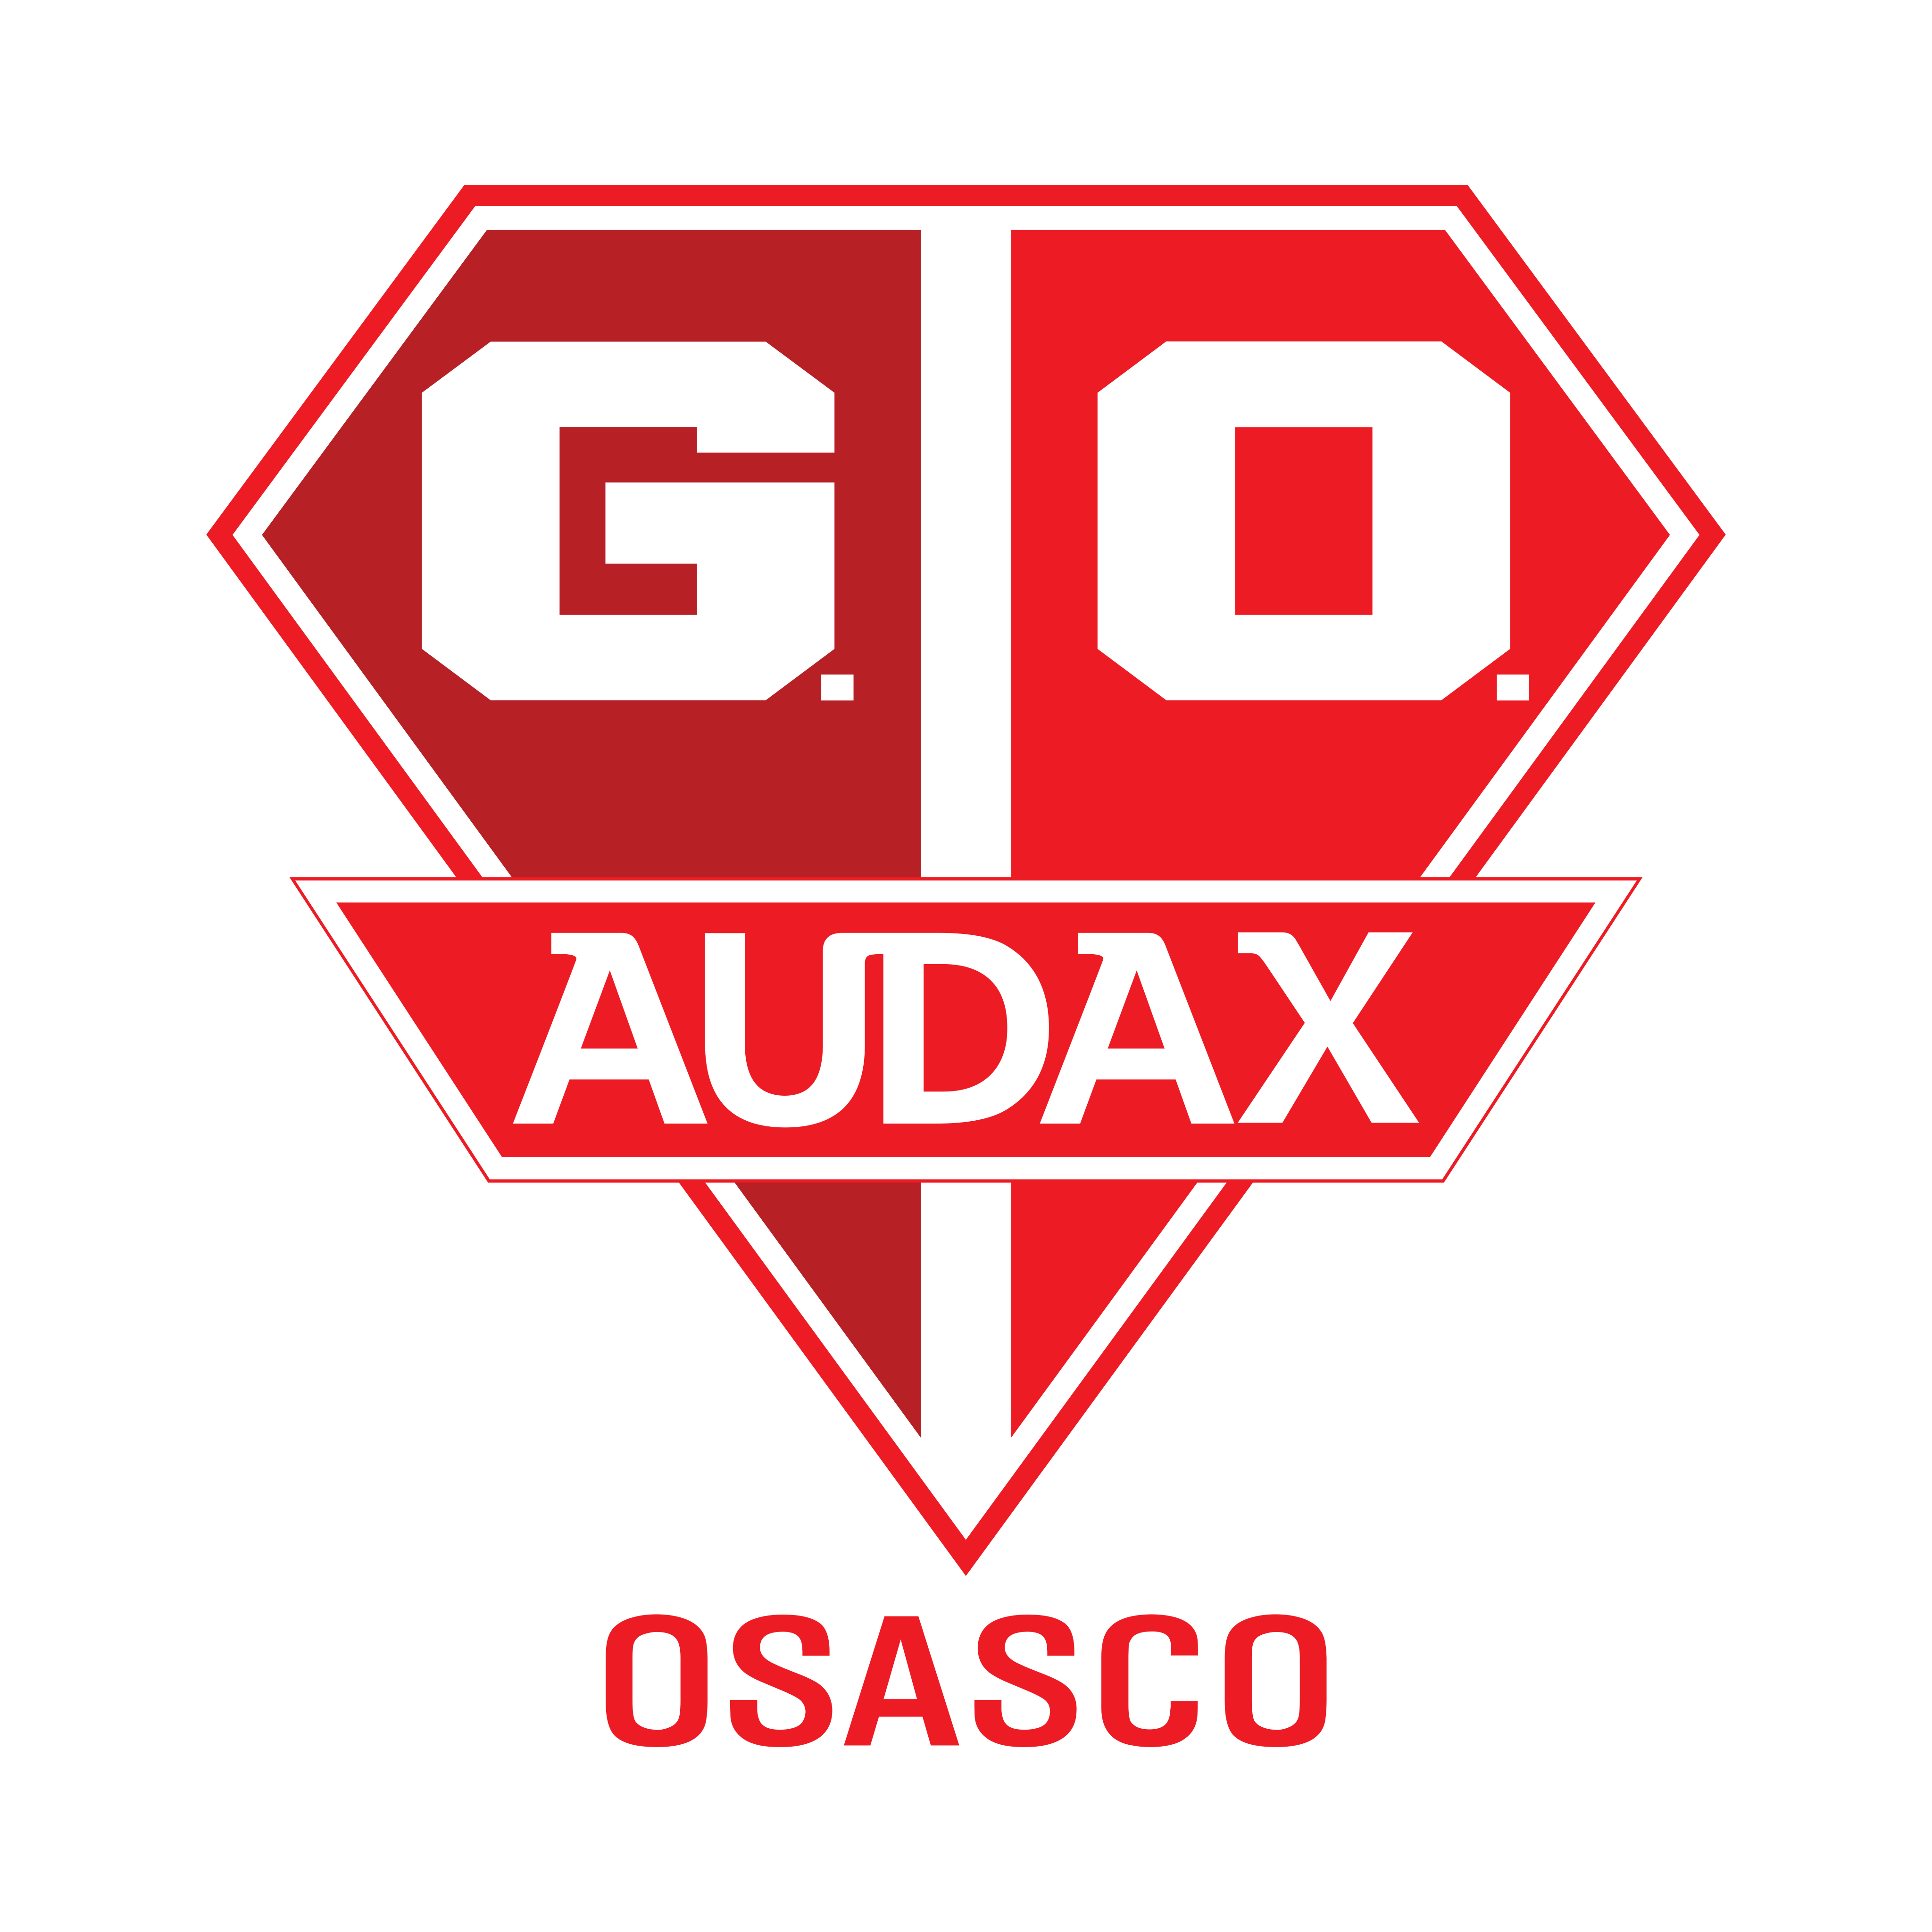 gremio osasco audax logo 0 - Grêmio Osasco Audax Logo